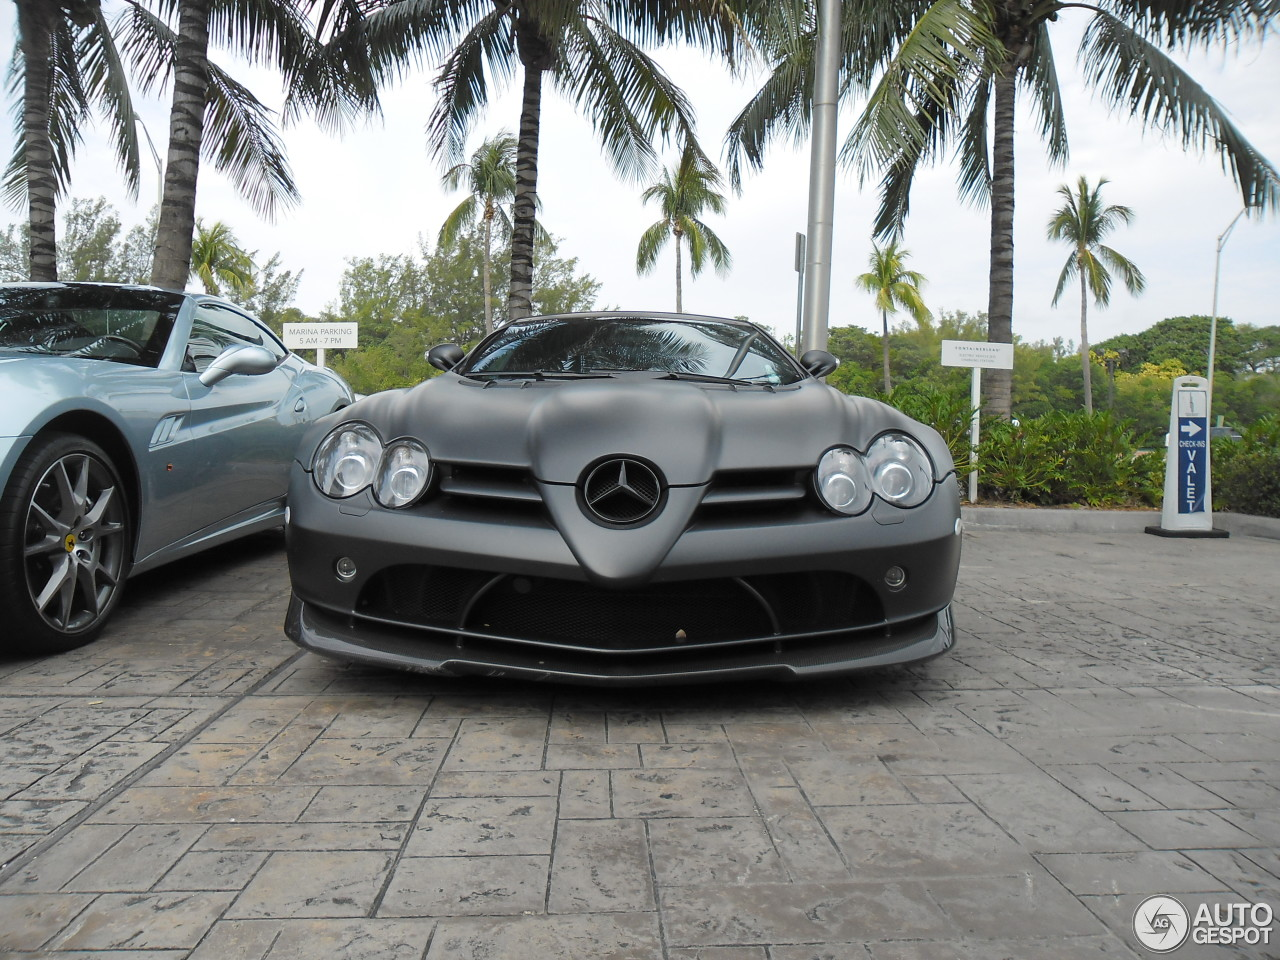 Mercedes benz slr mclaren roadster 722 s 24 march 2013 for Mercedes benz slr price